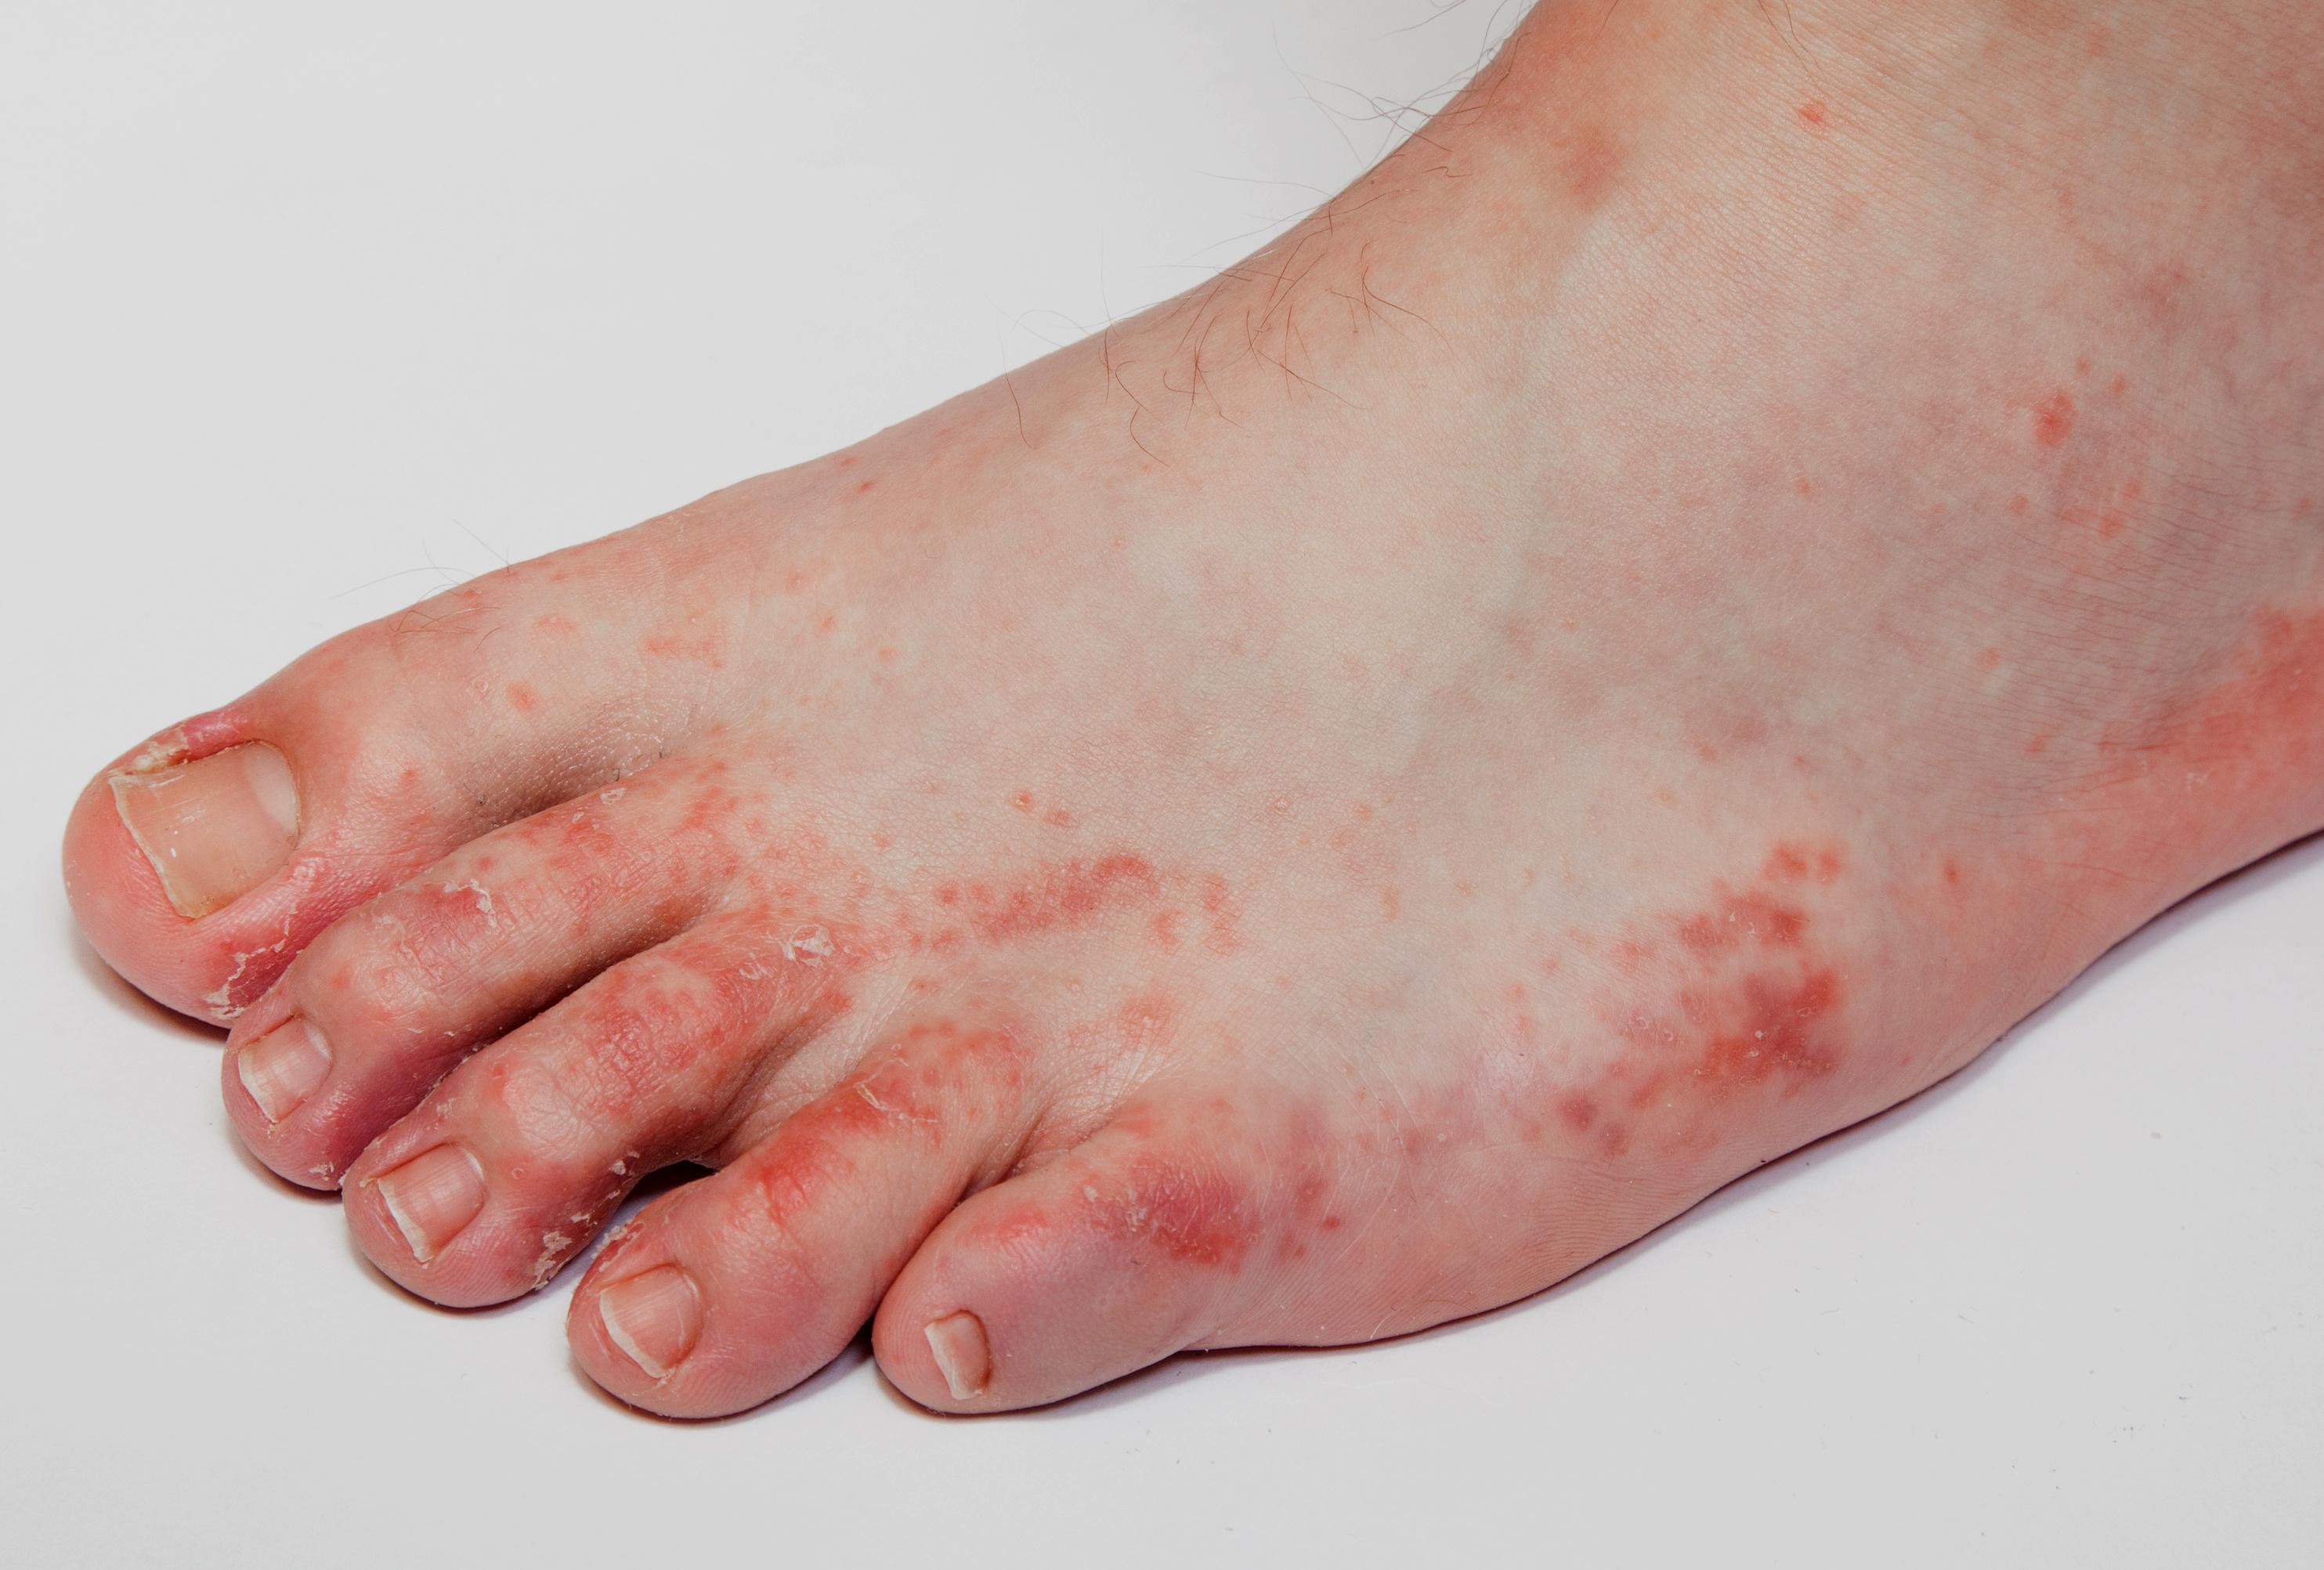 vörös foltok a lábon a bőrön)